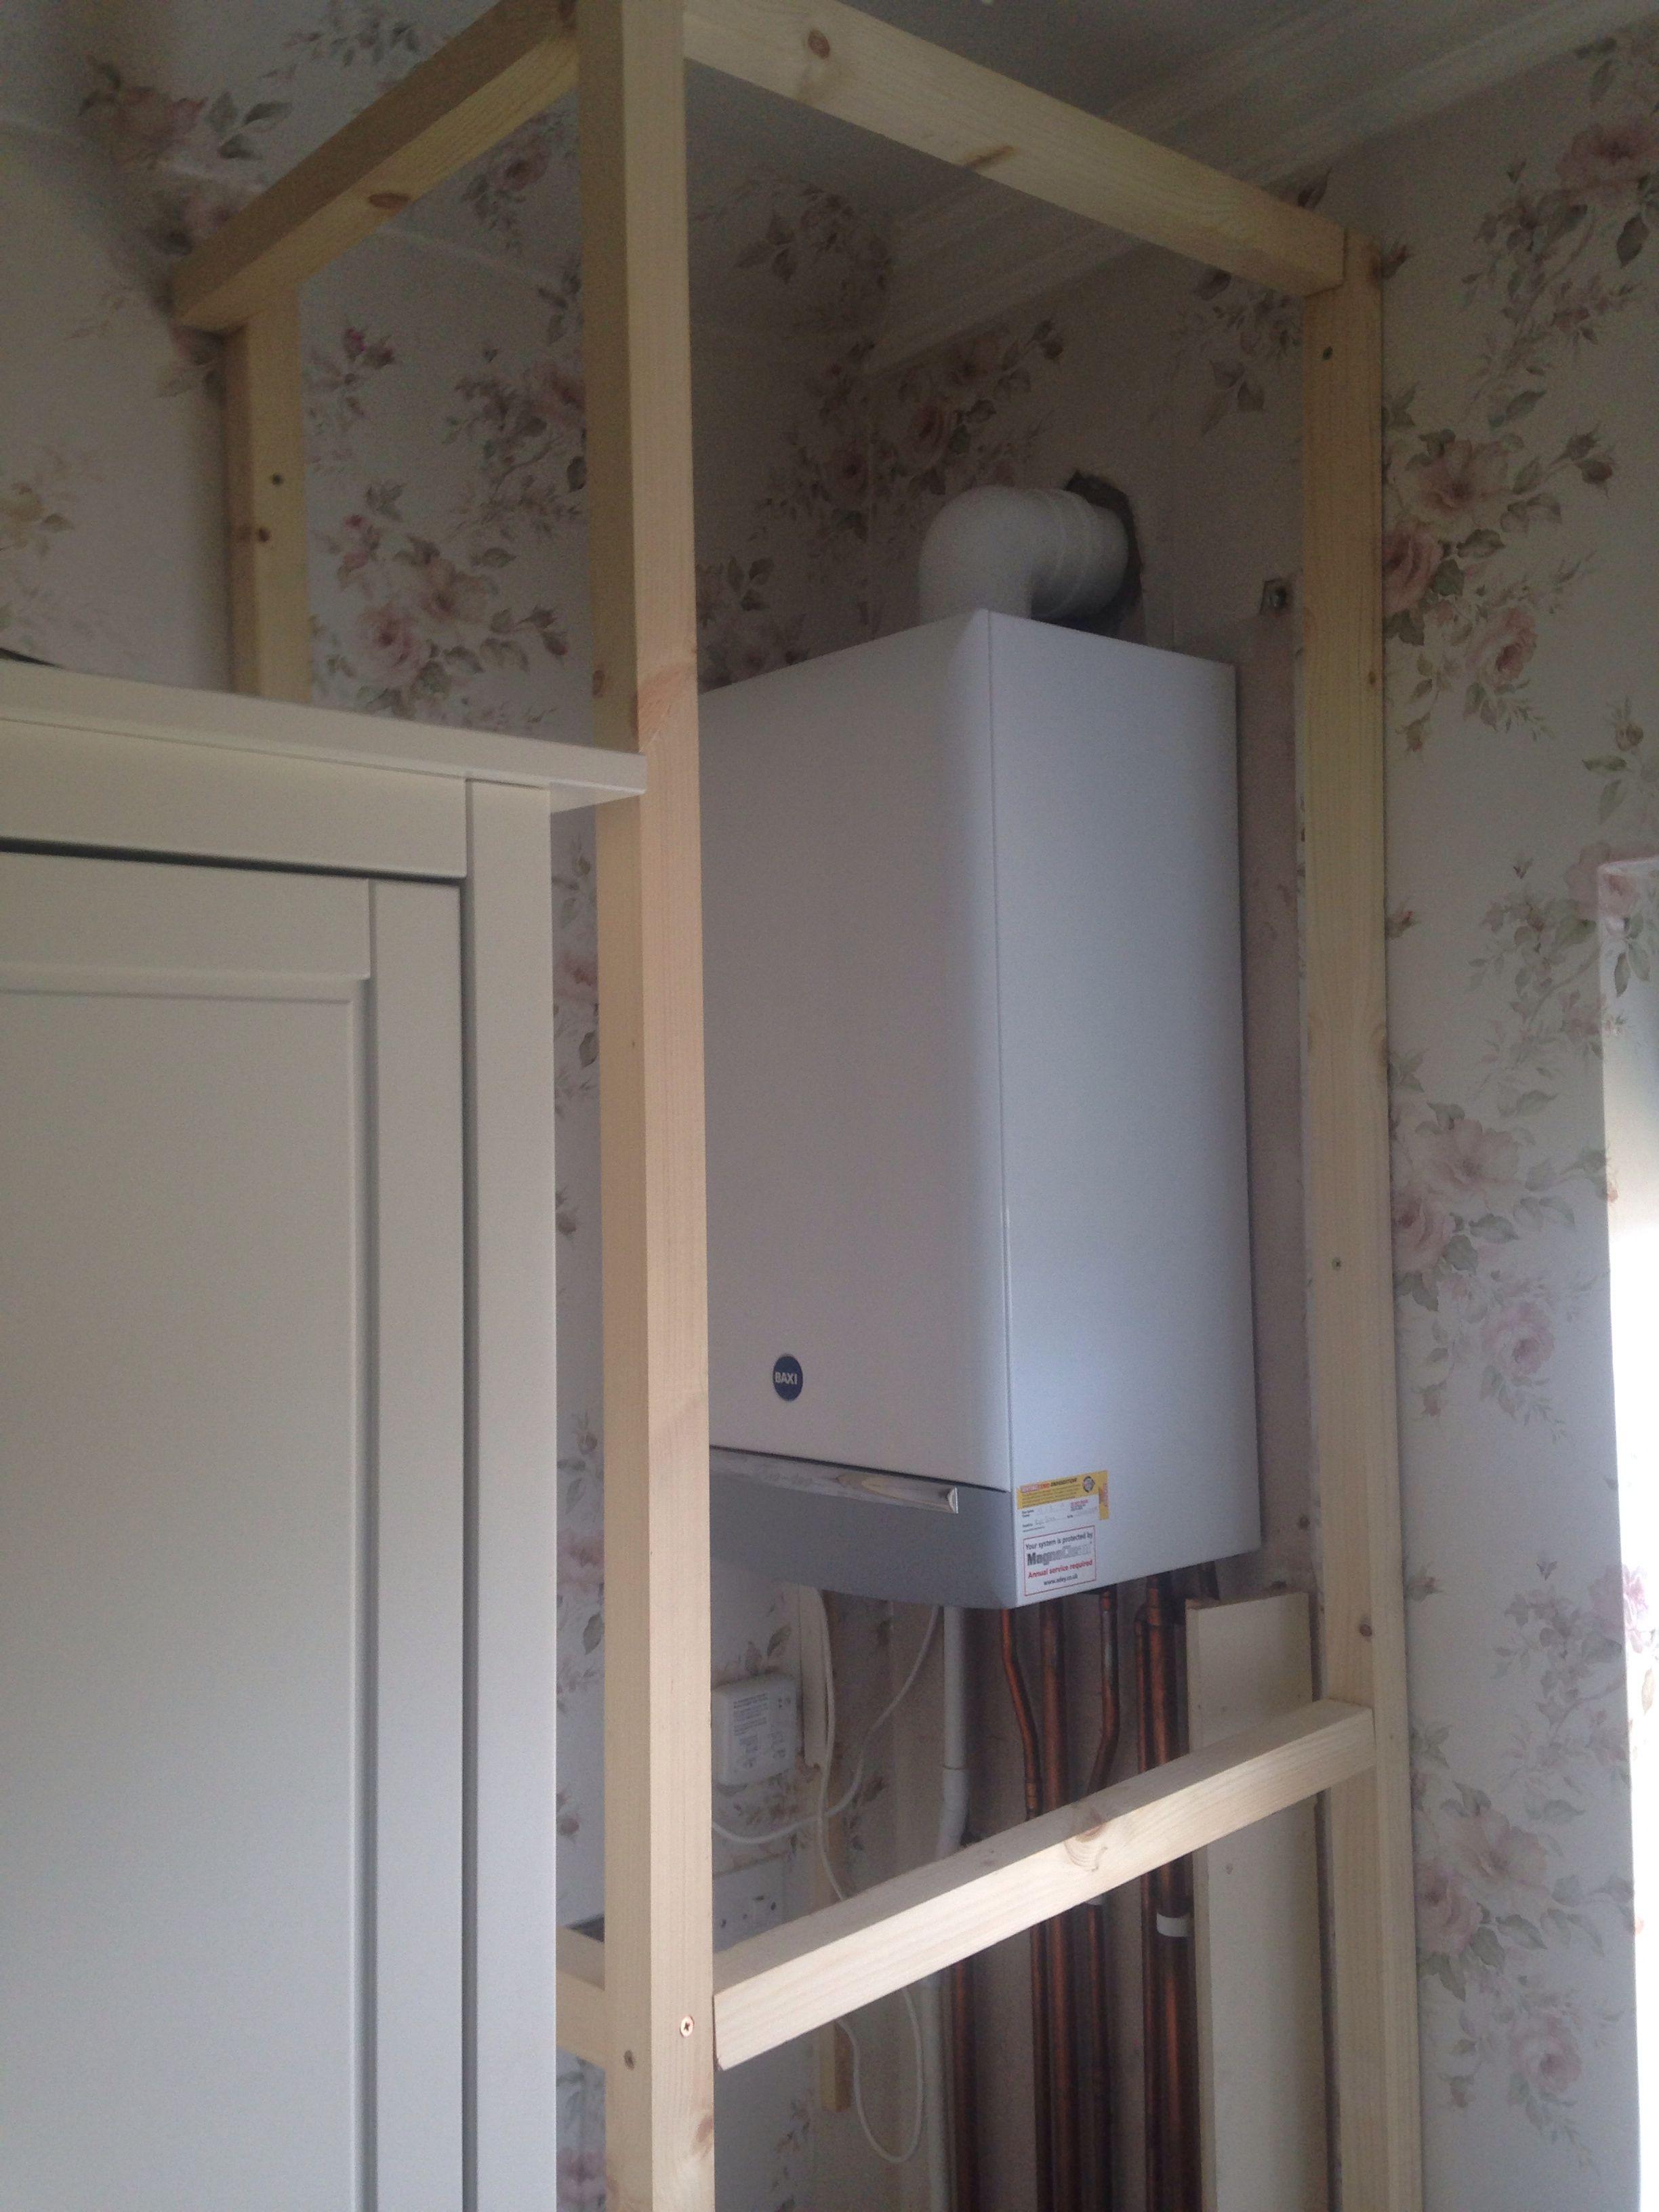 Boiler Frame In 2019 Bedroom Alcove Boiler Cover Ideas